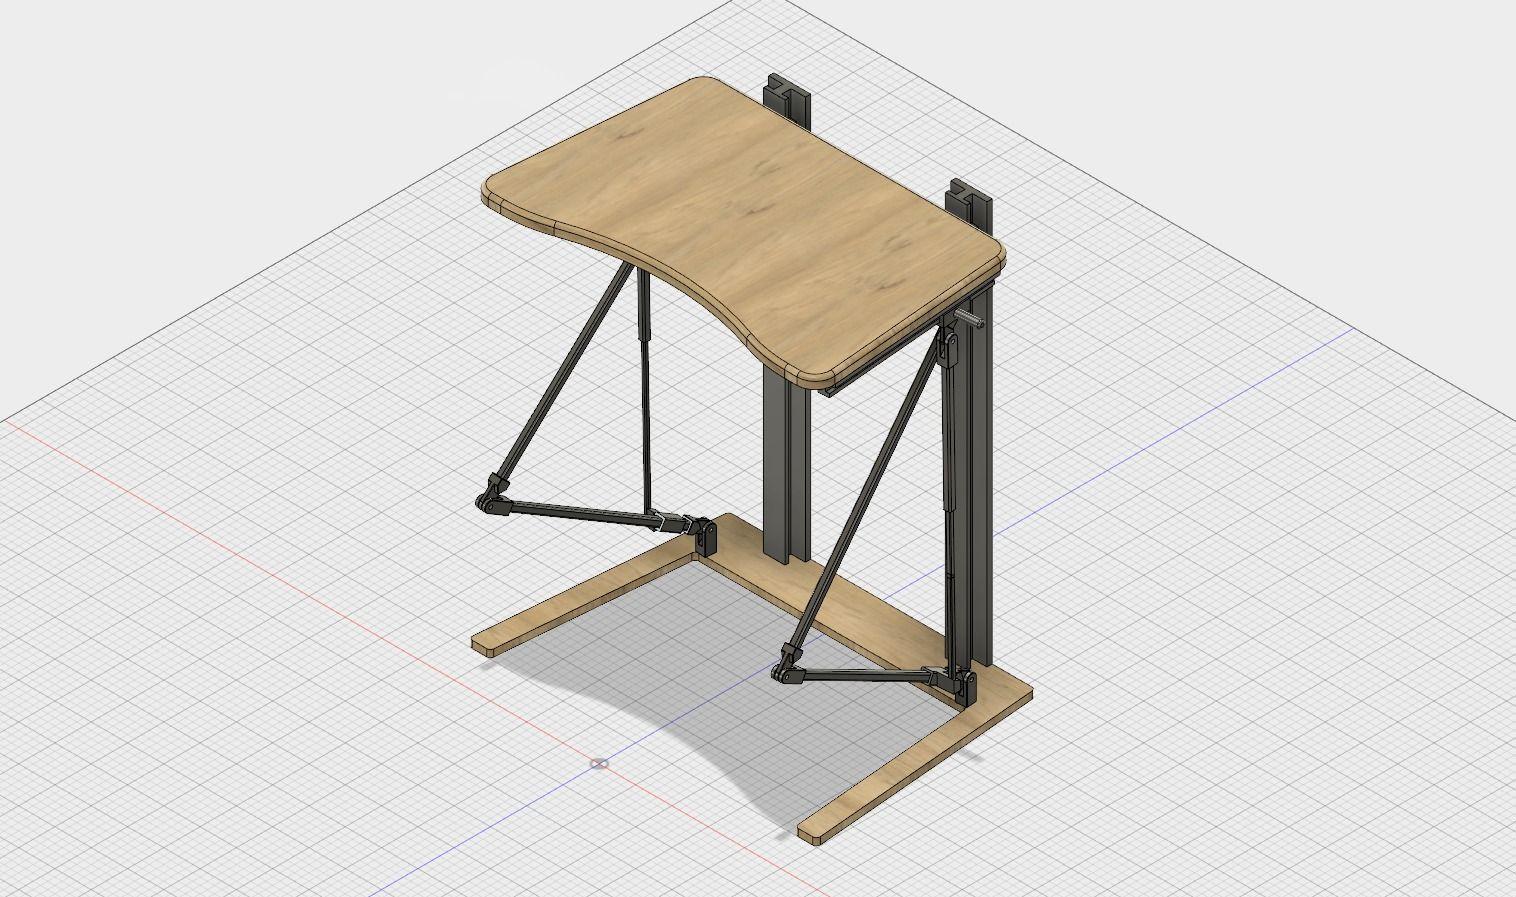 Desk2-3500-3500